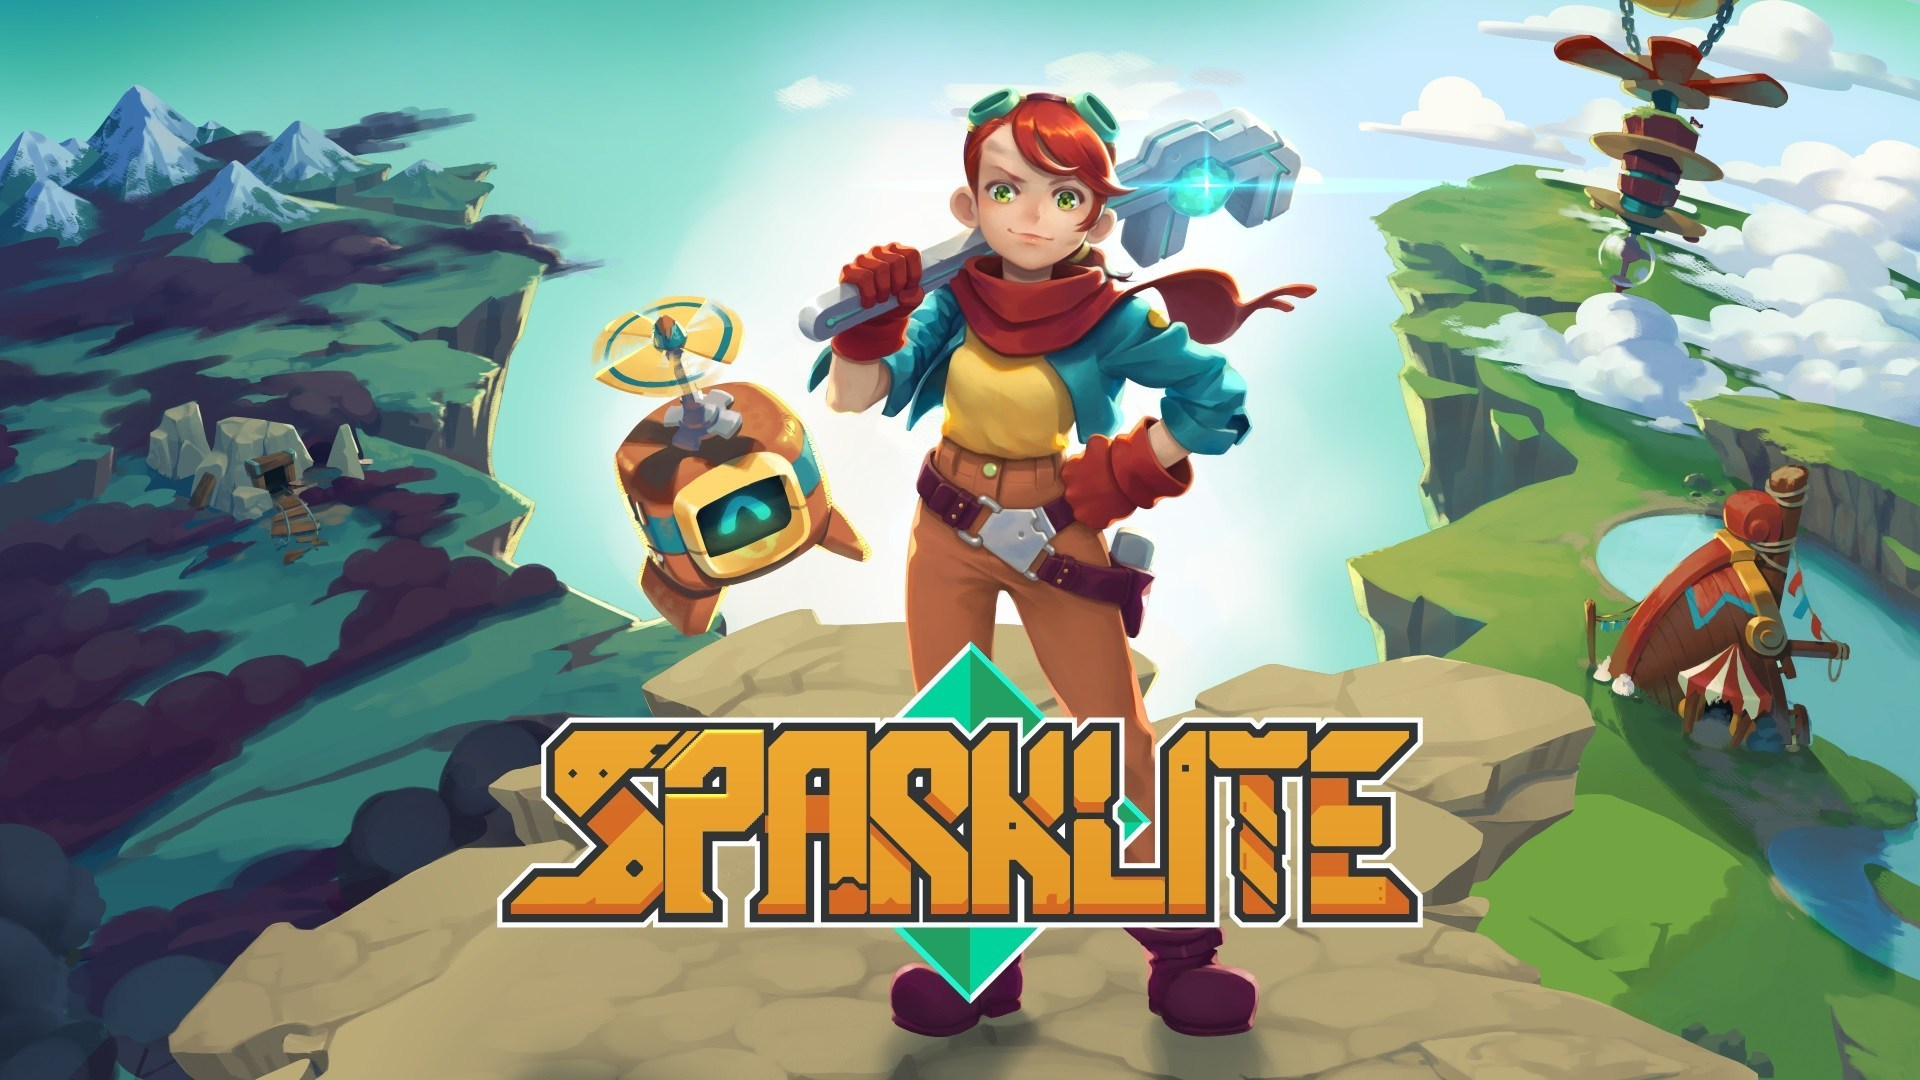 sparklite video game wallpaper 69455